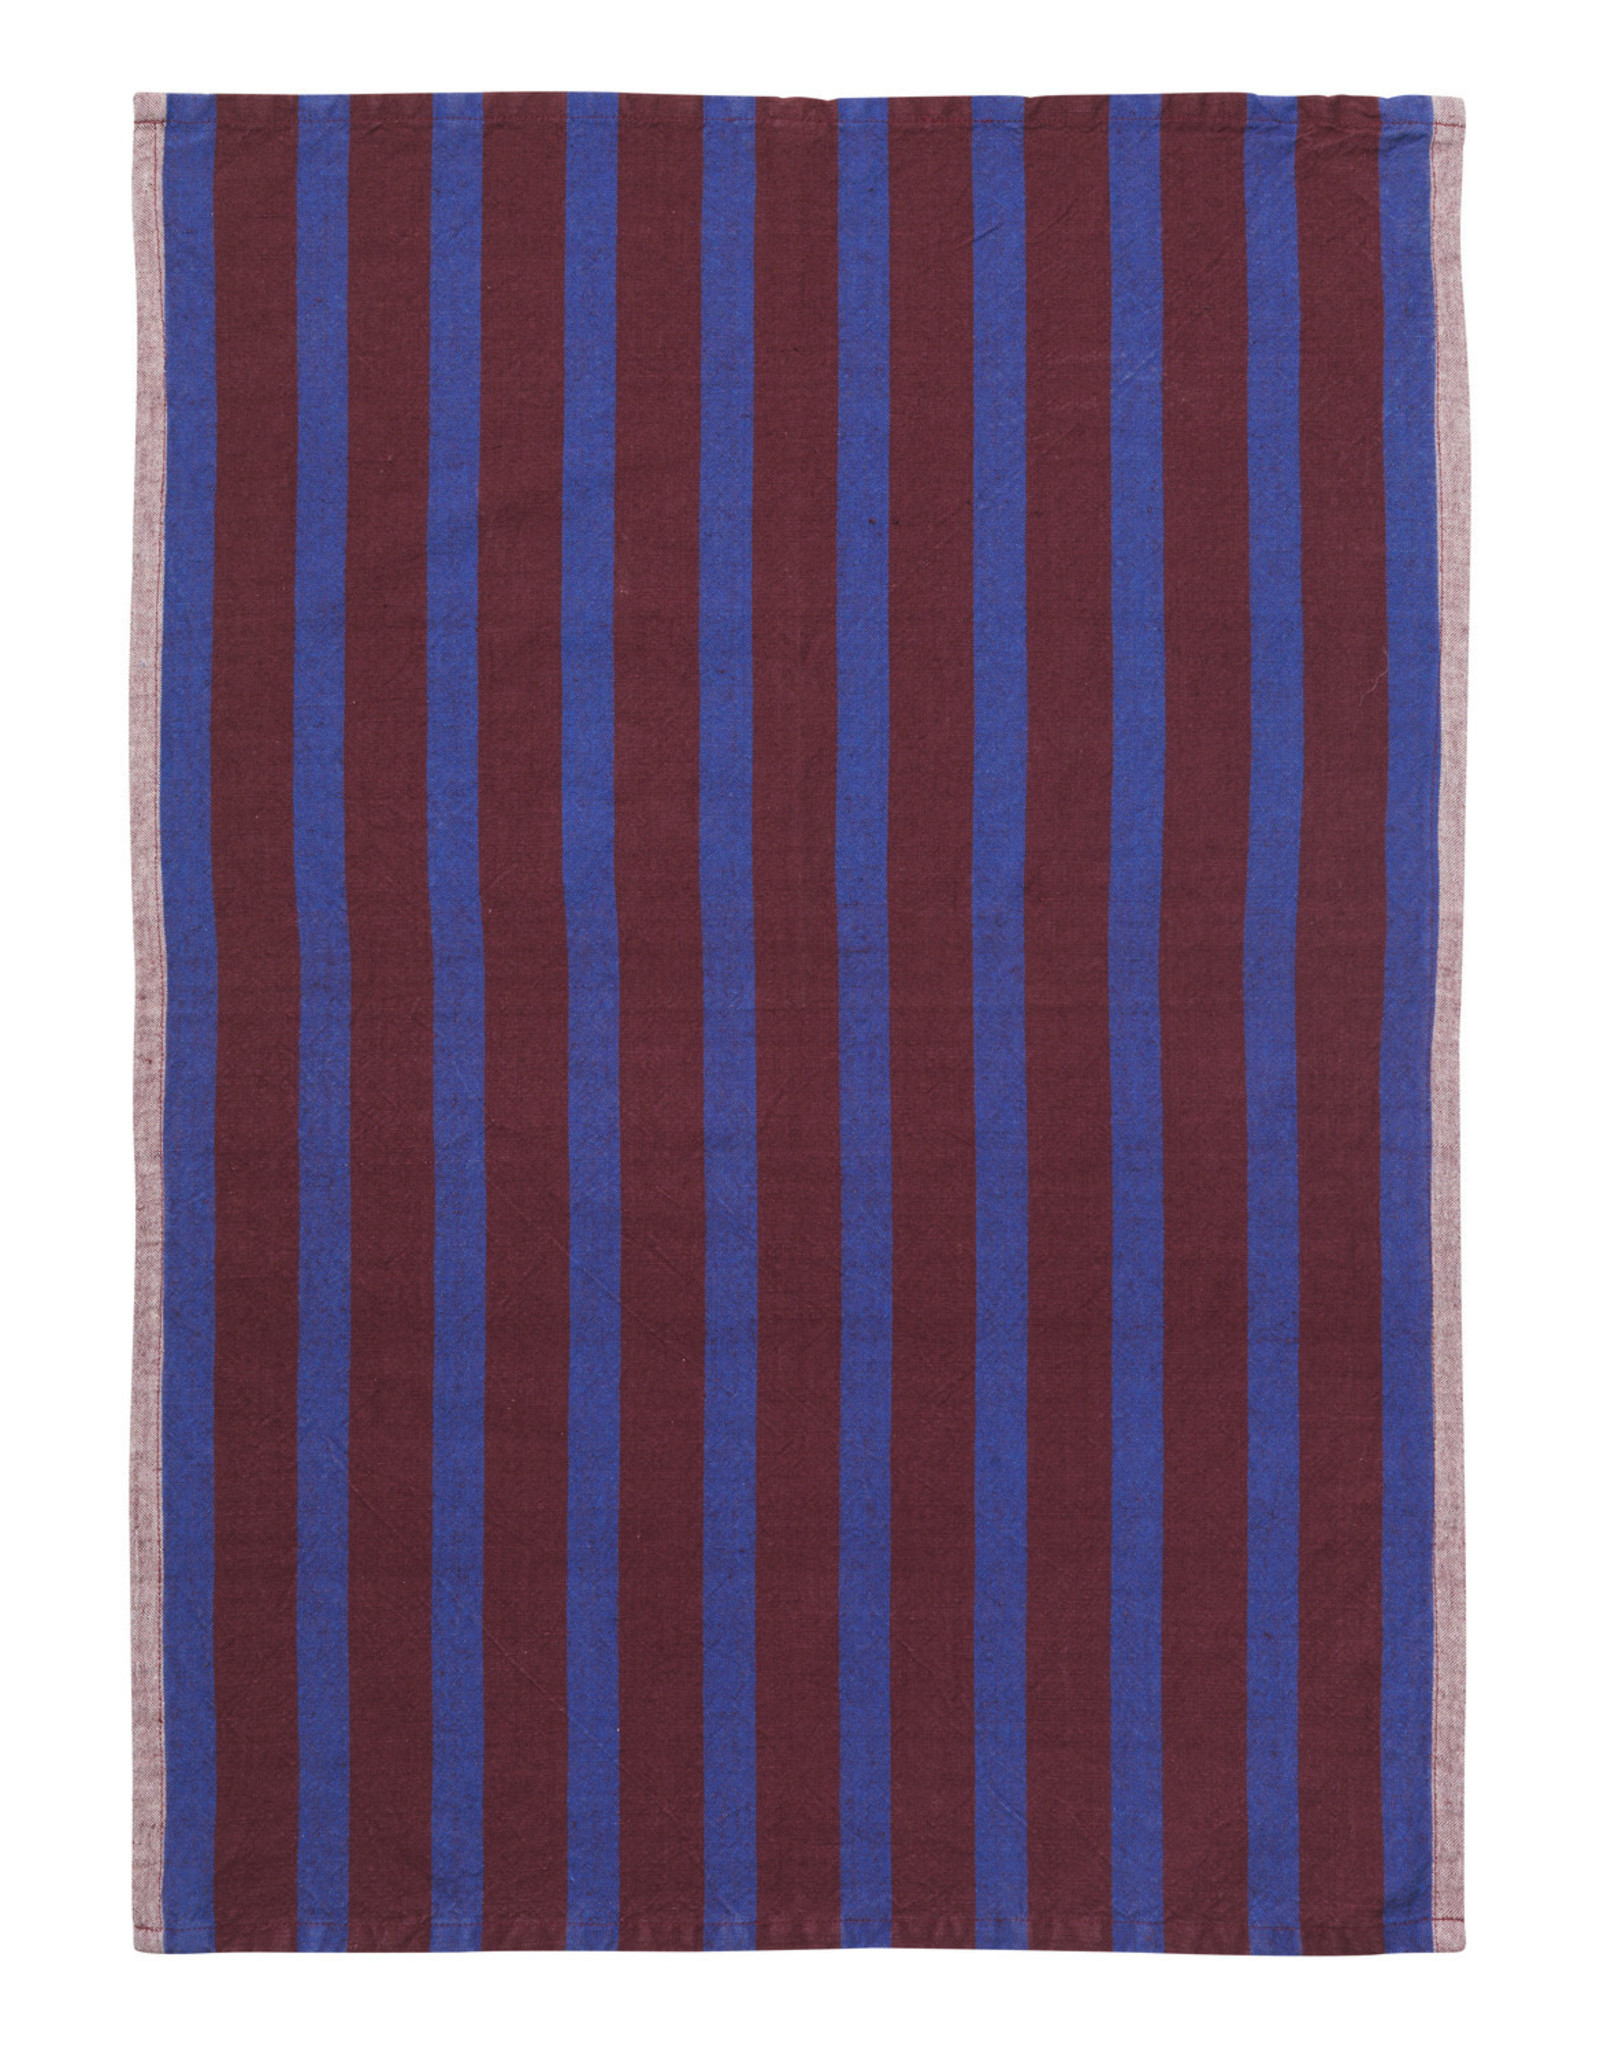 Ferm LIVING ferm LIVING Hale Tea Towel Brown/Navy Blue